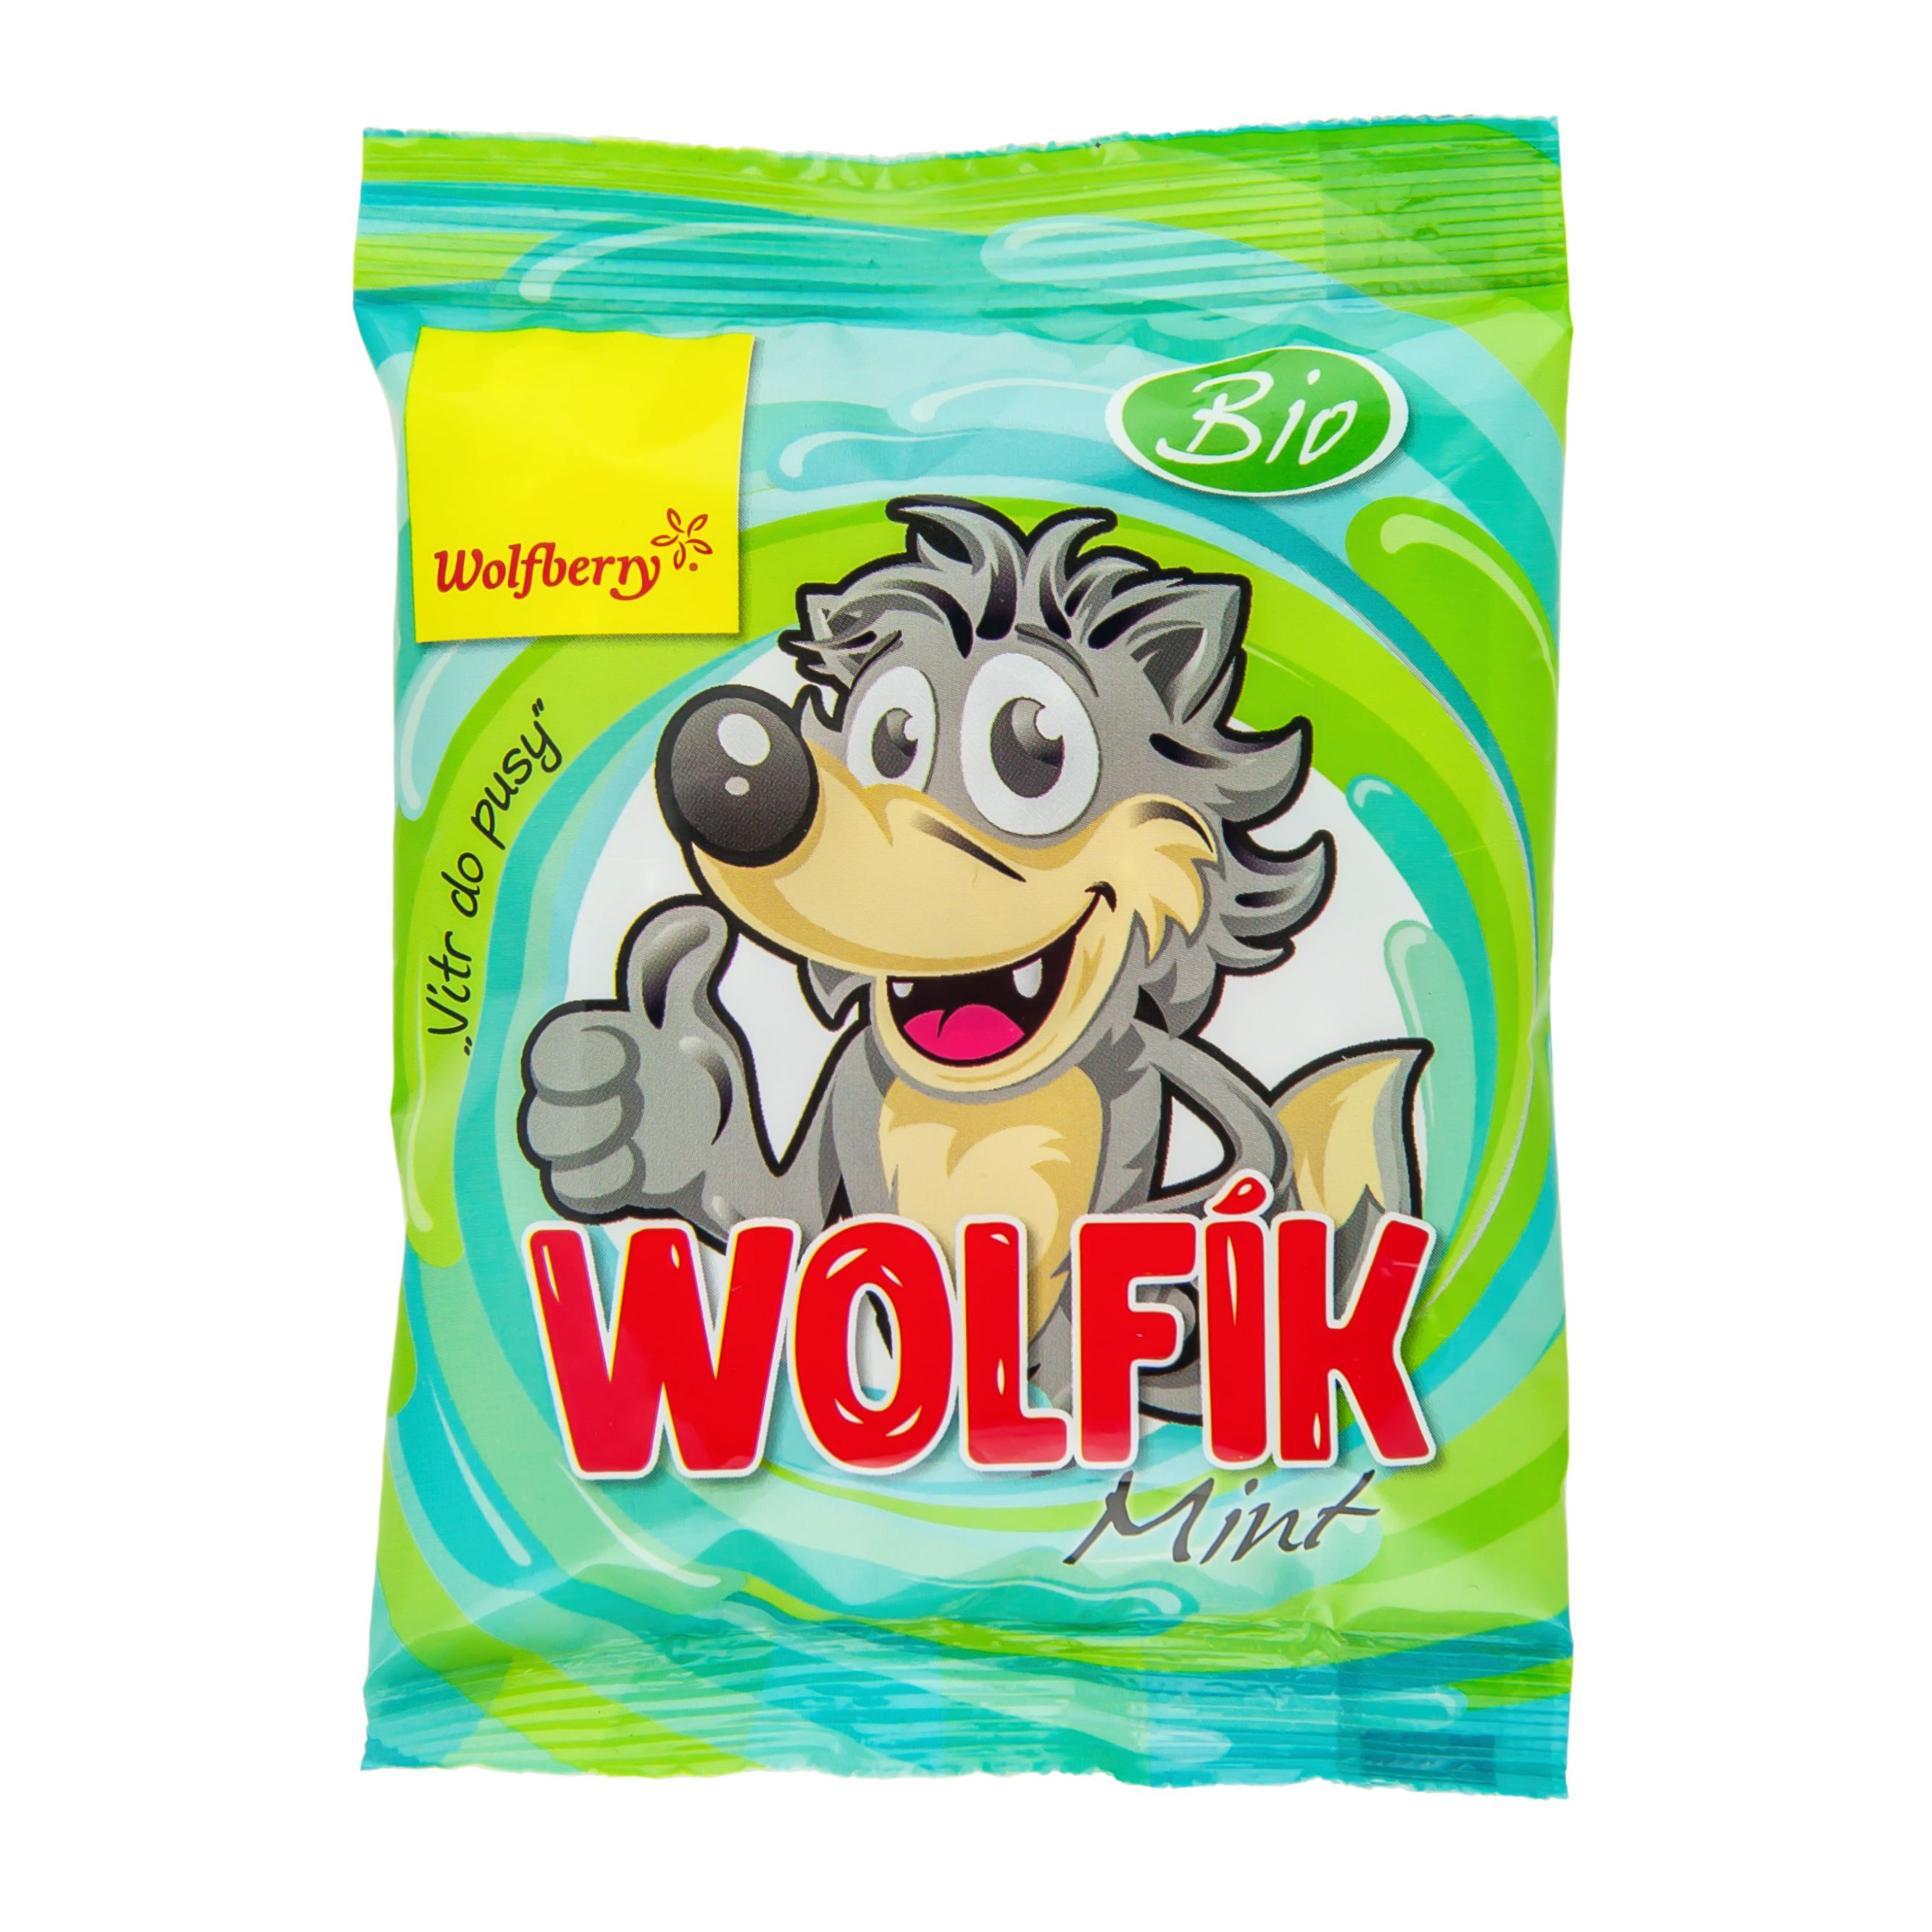 Wolfík Mint 85 g Wolfberry